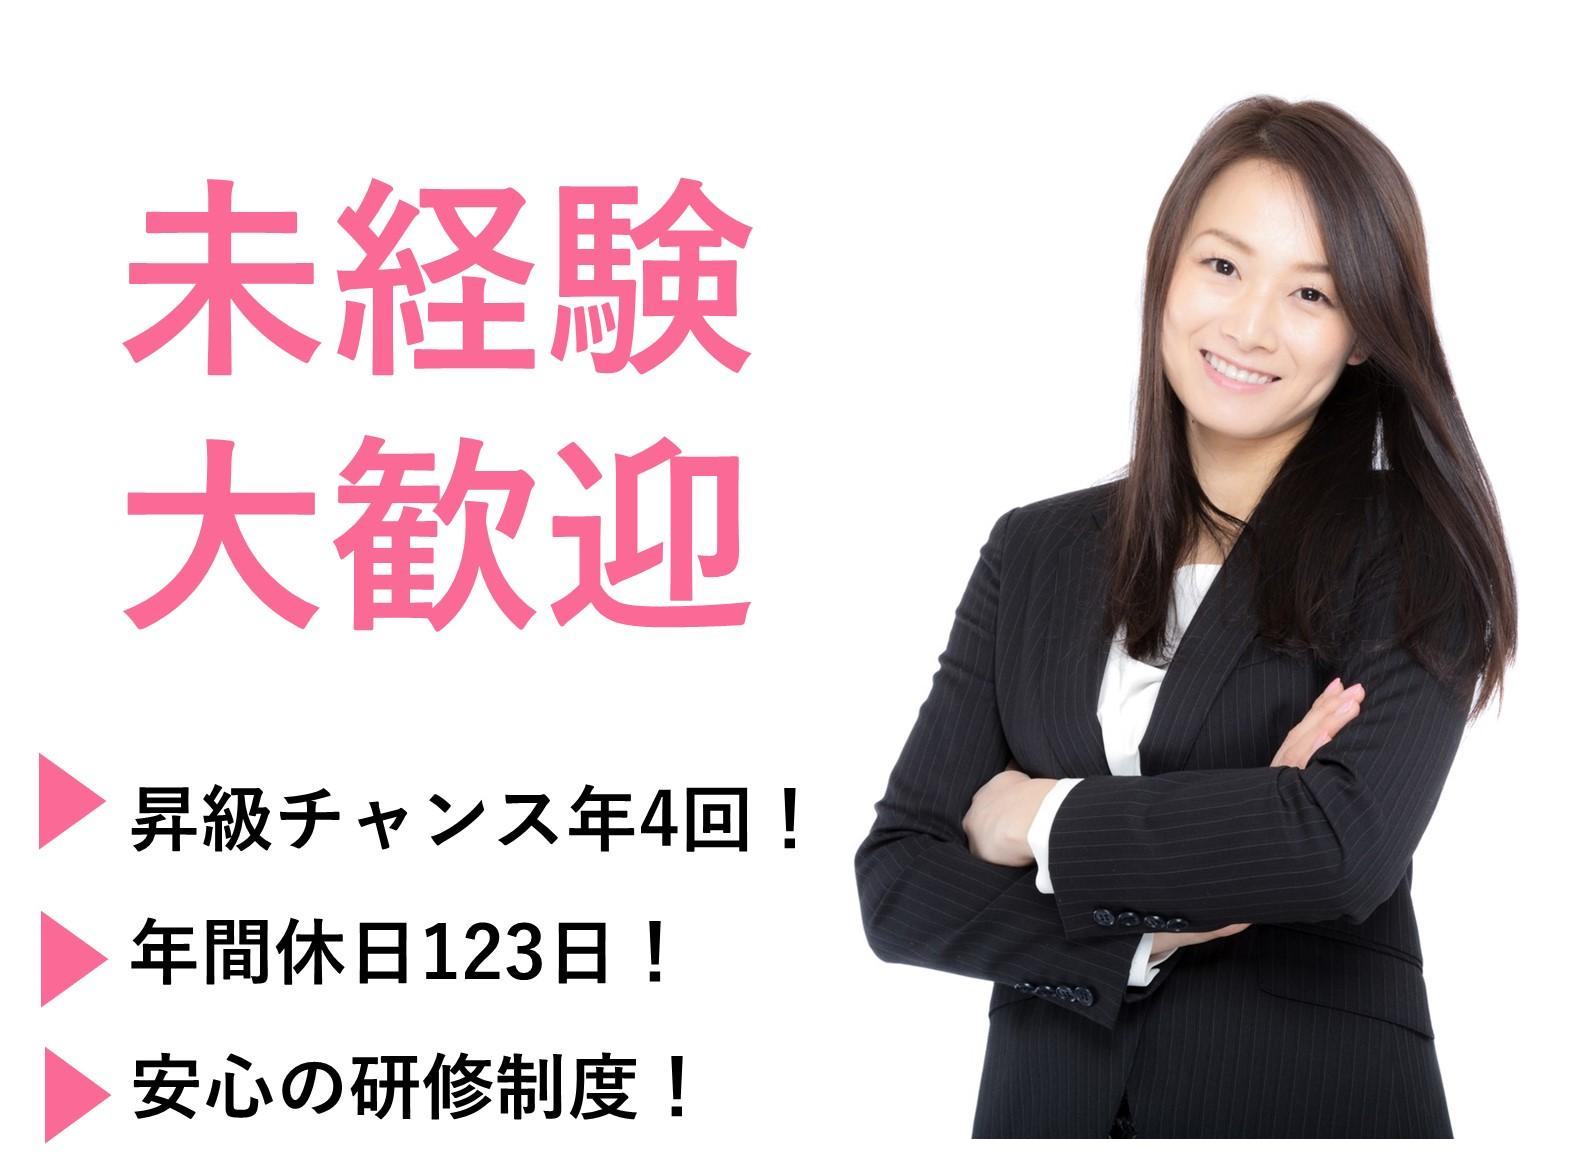 即面談可能【正社員】昇進年4回!年休123日!牛丼屋店舗運営スタッフ イメージ